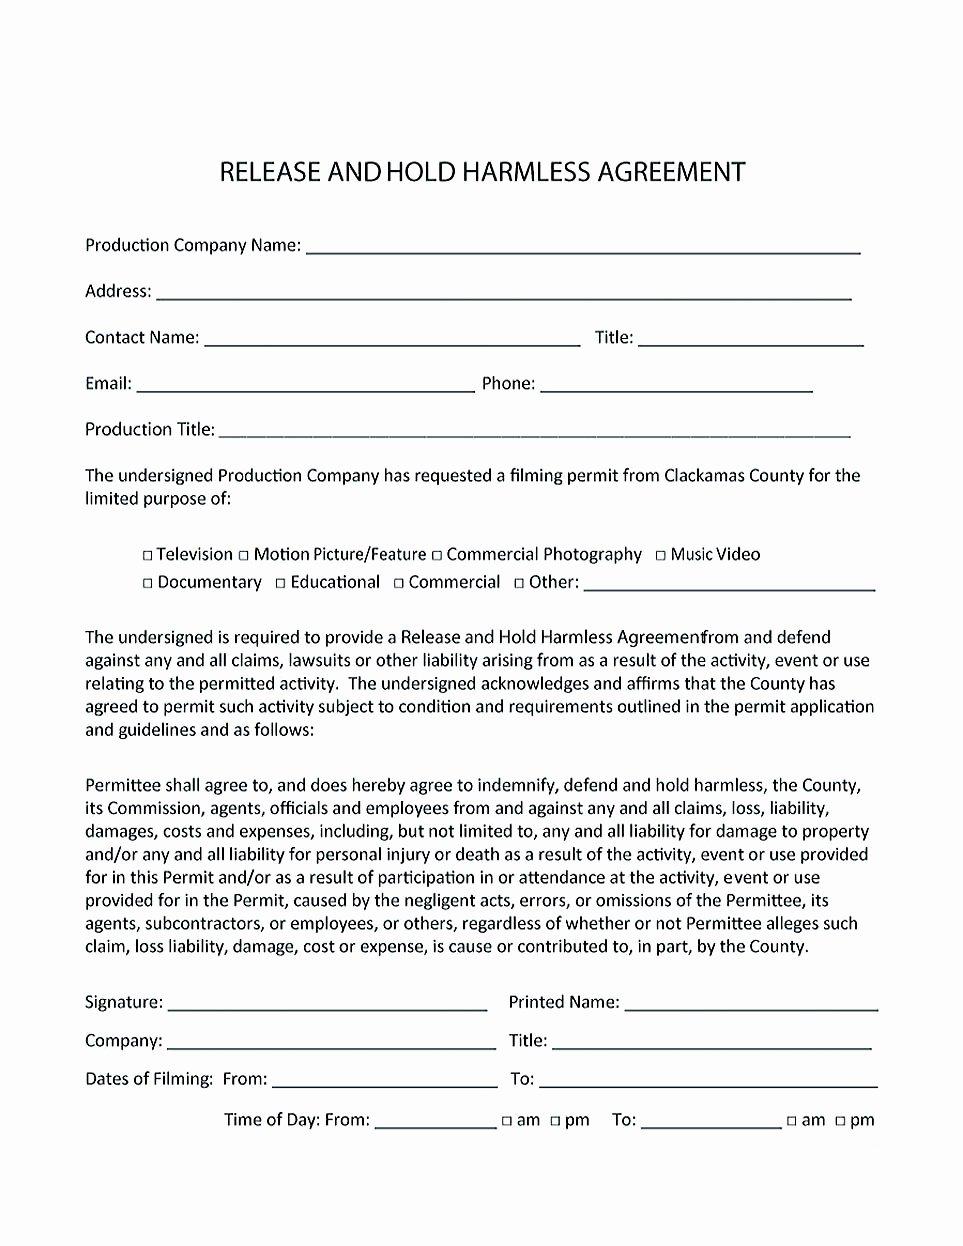 Hold Harmless Agreement Template Free Luxury Making Hold Harmless Agreement Template for Different Purposes